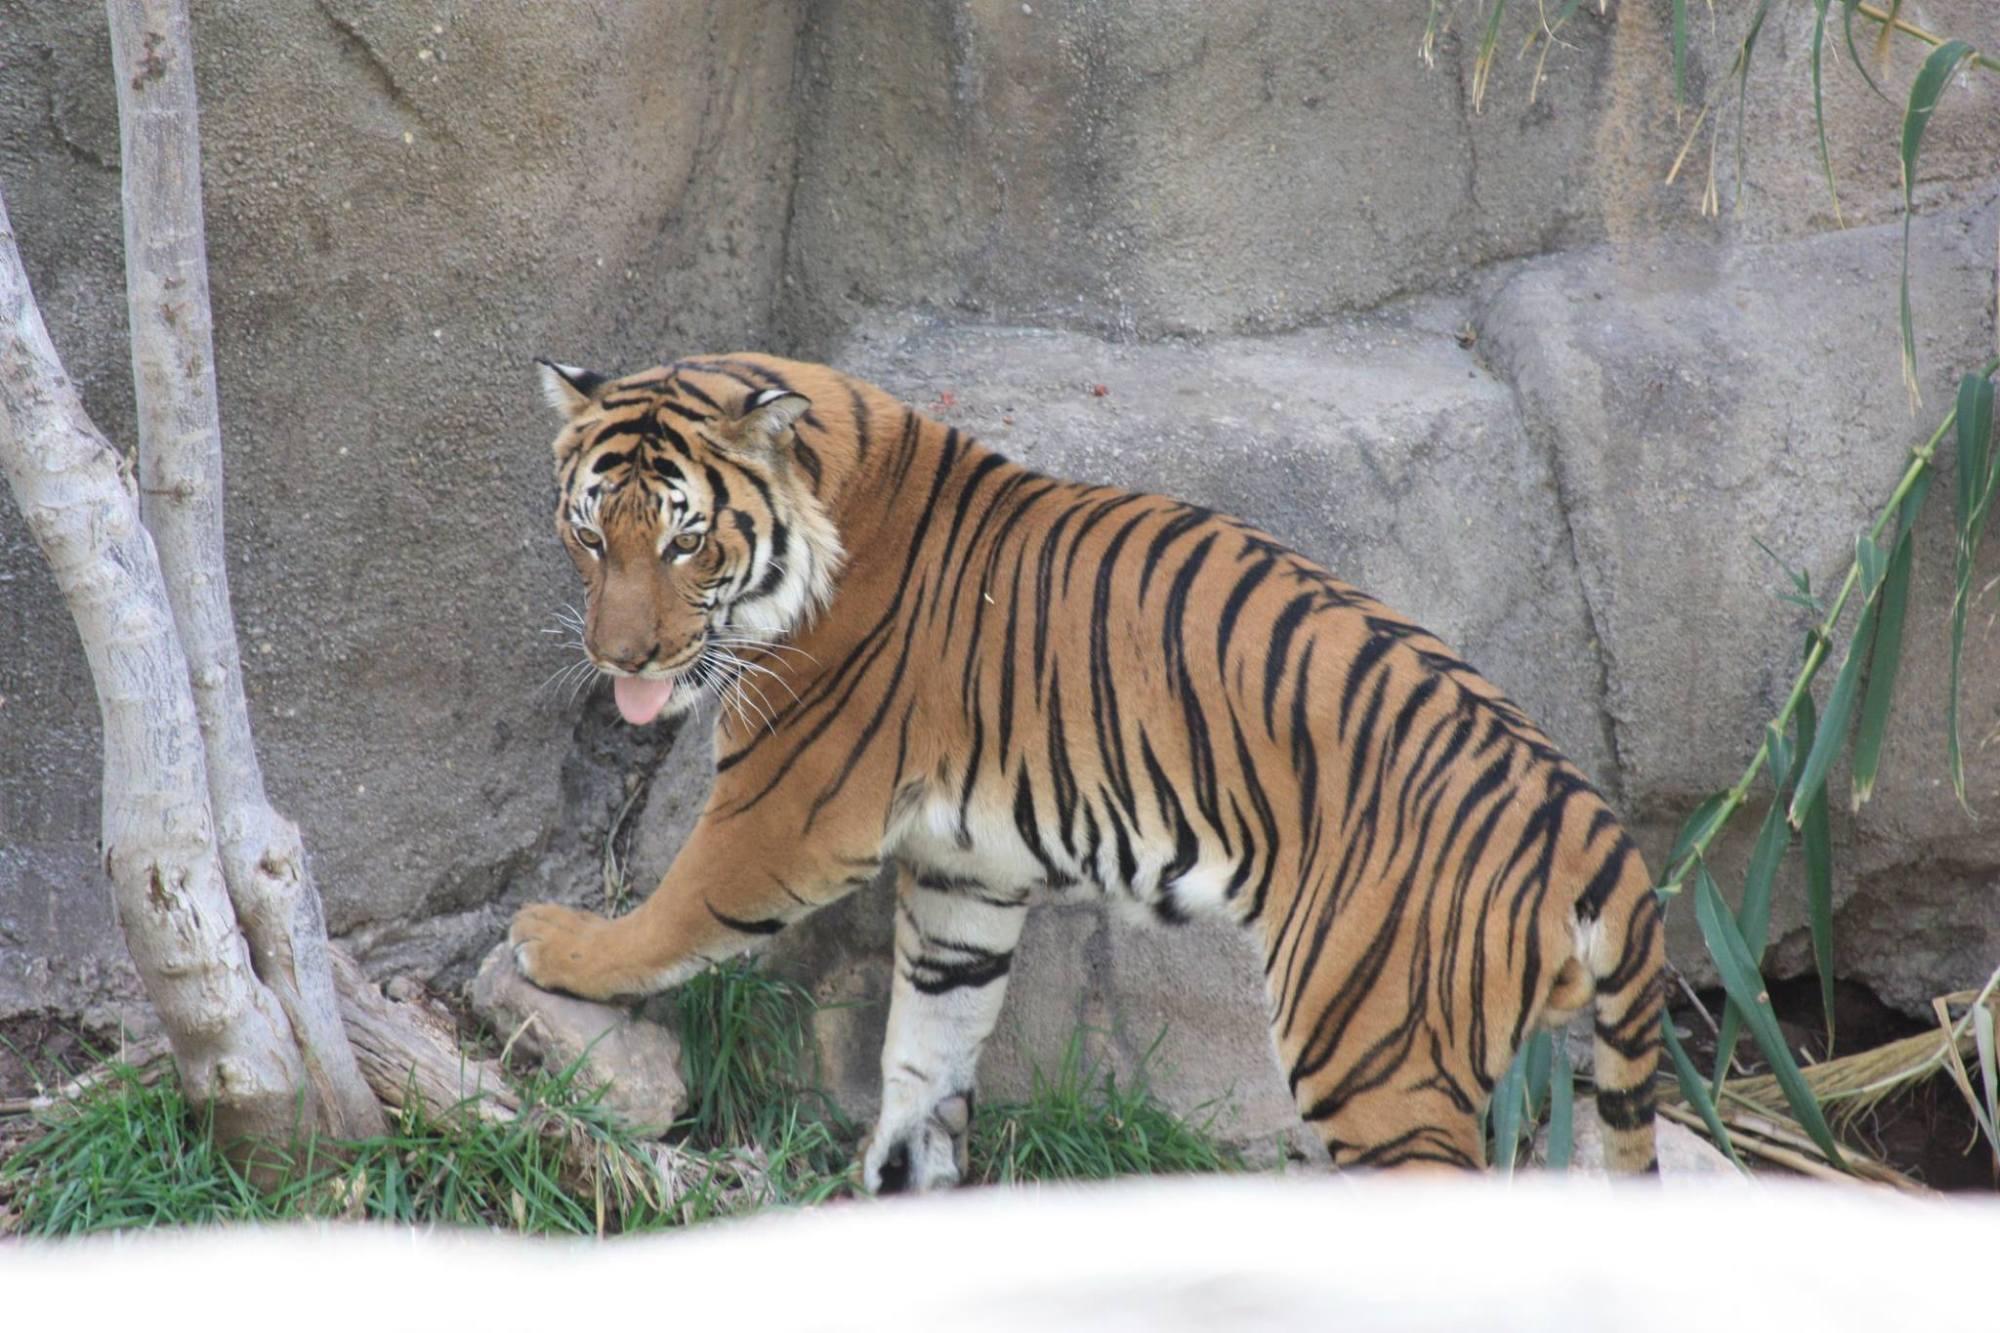 zoo tiger_1495142073214.jpg